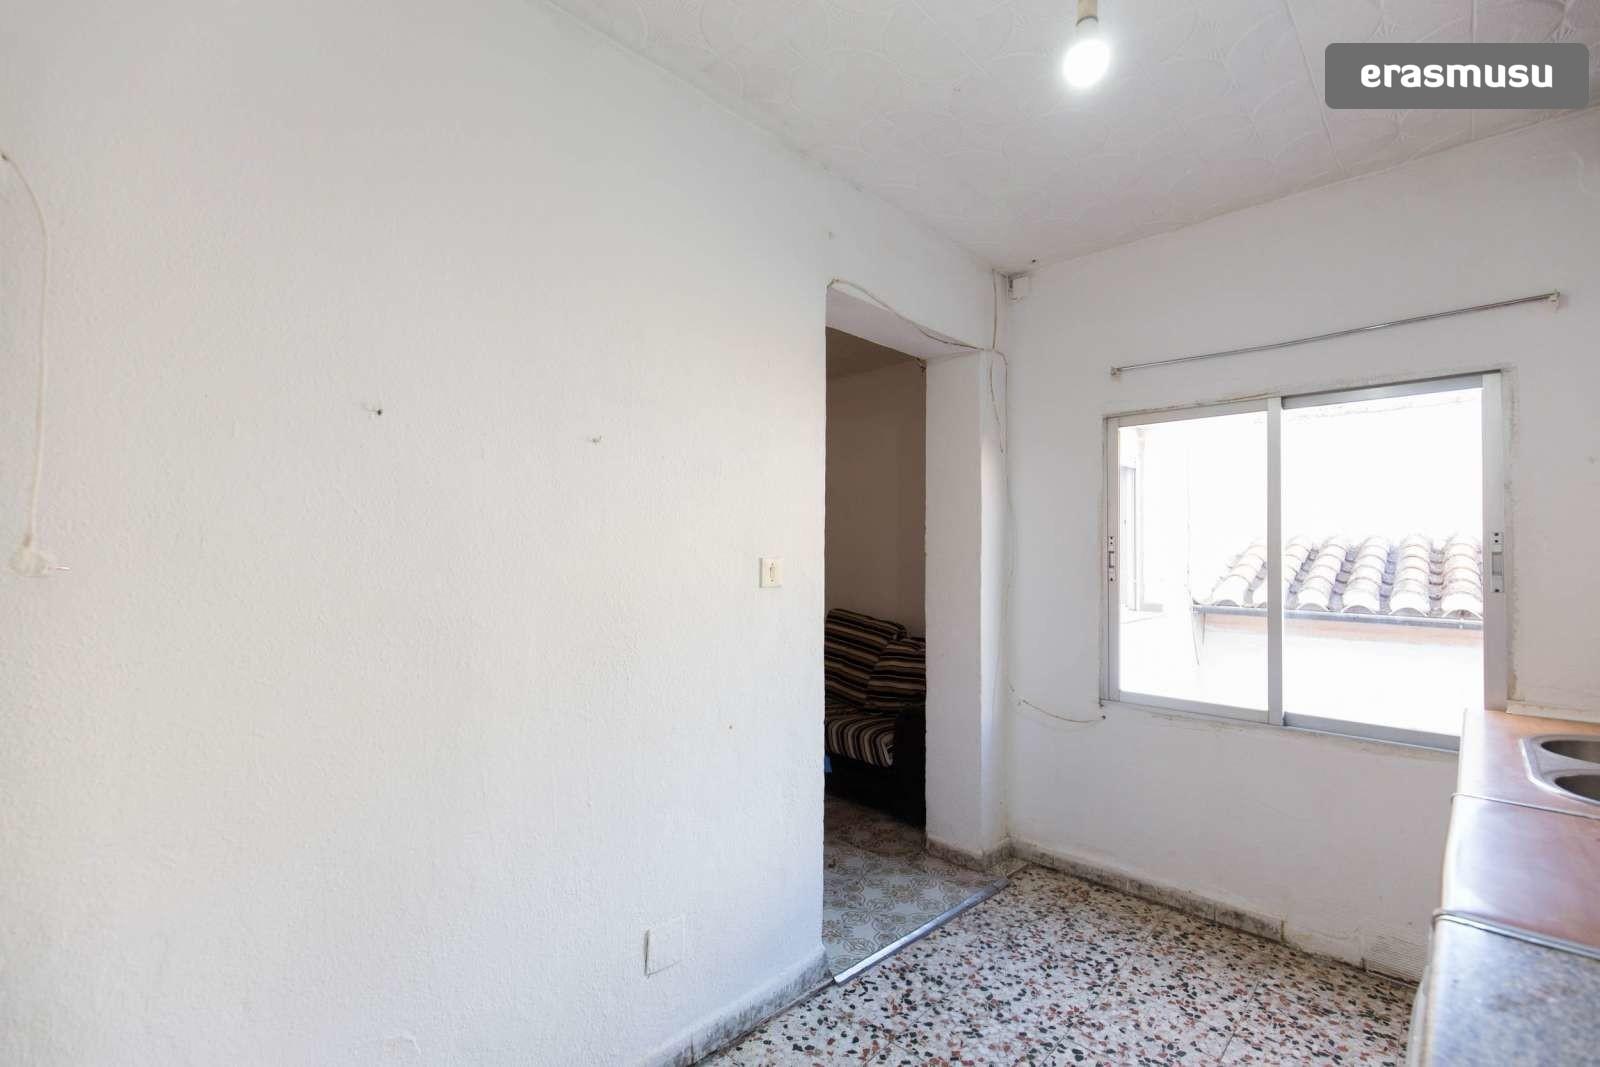 Calle Yeseros, 18011 Granada, Spain